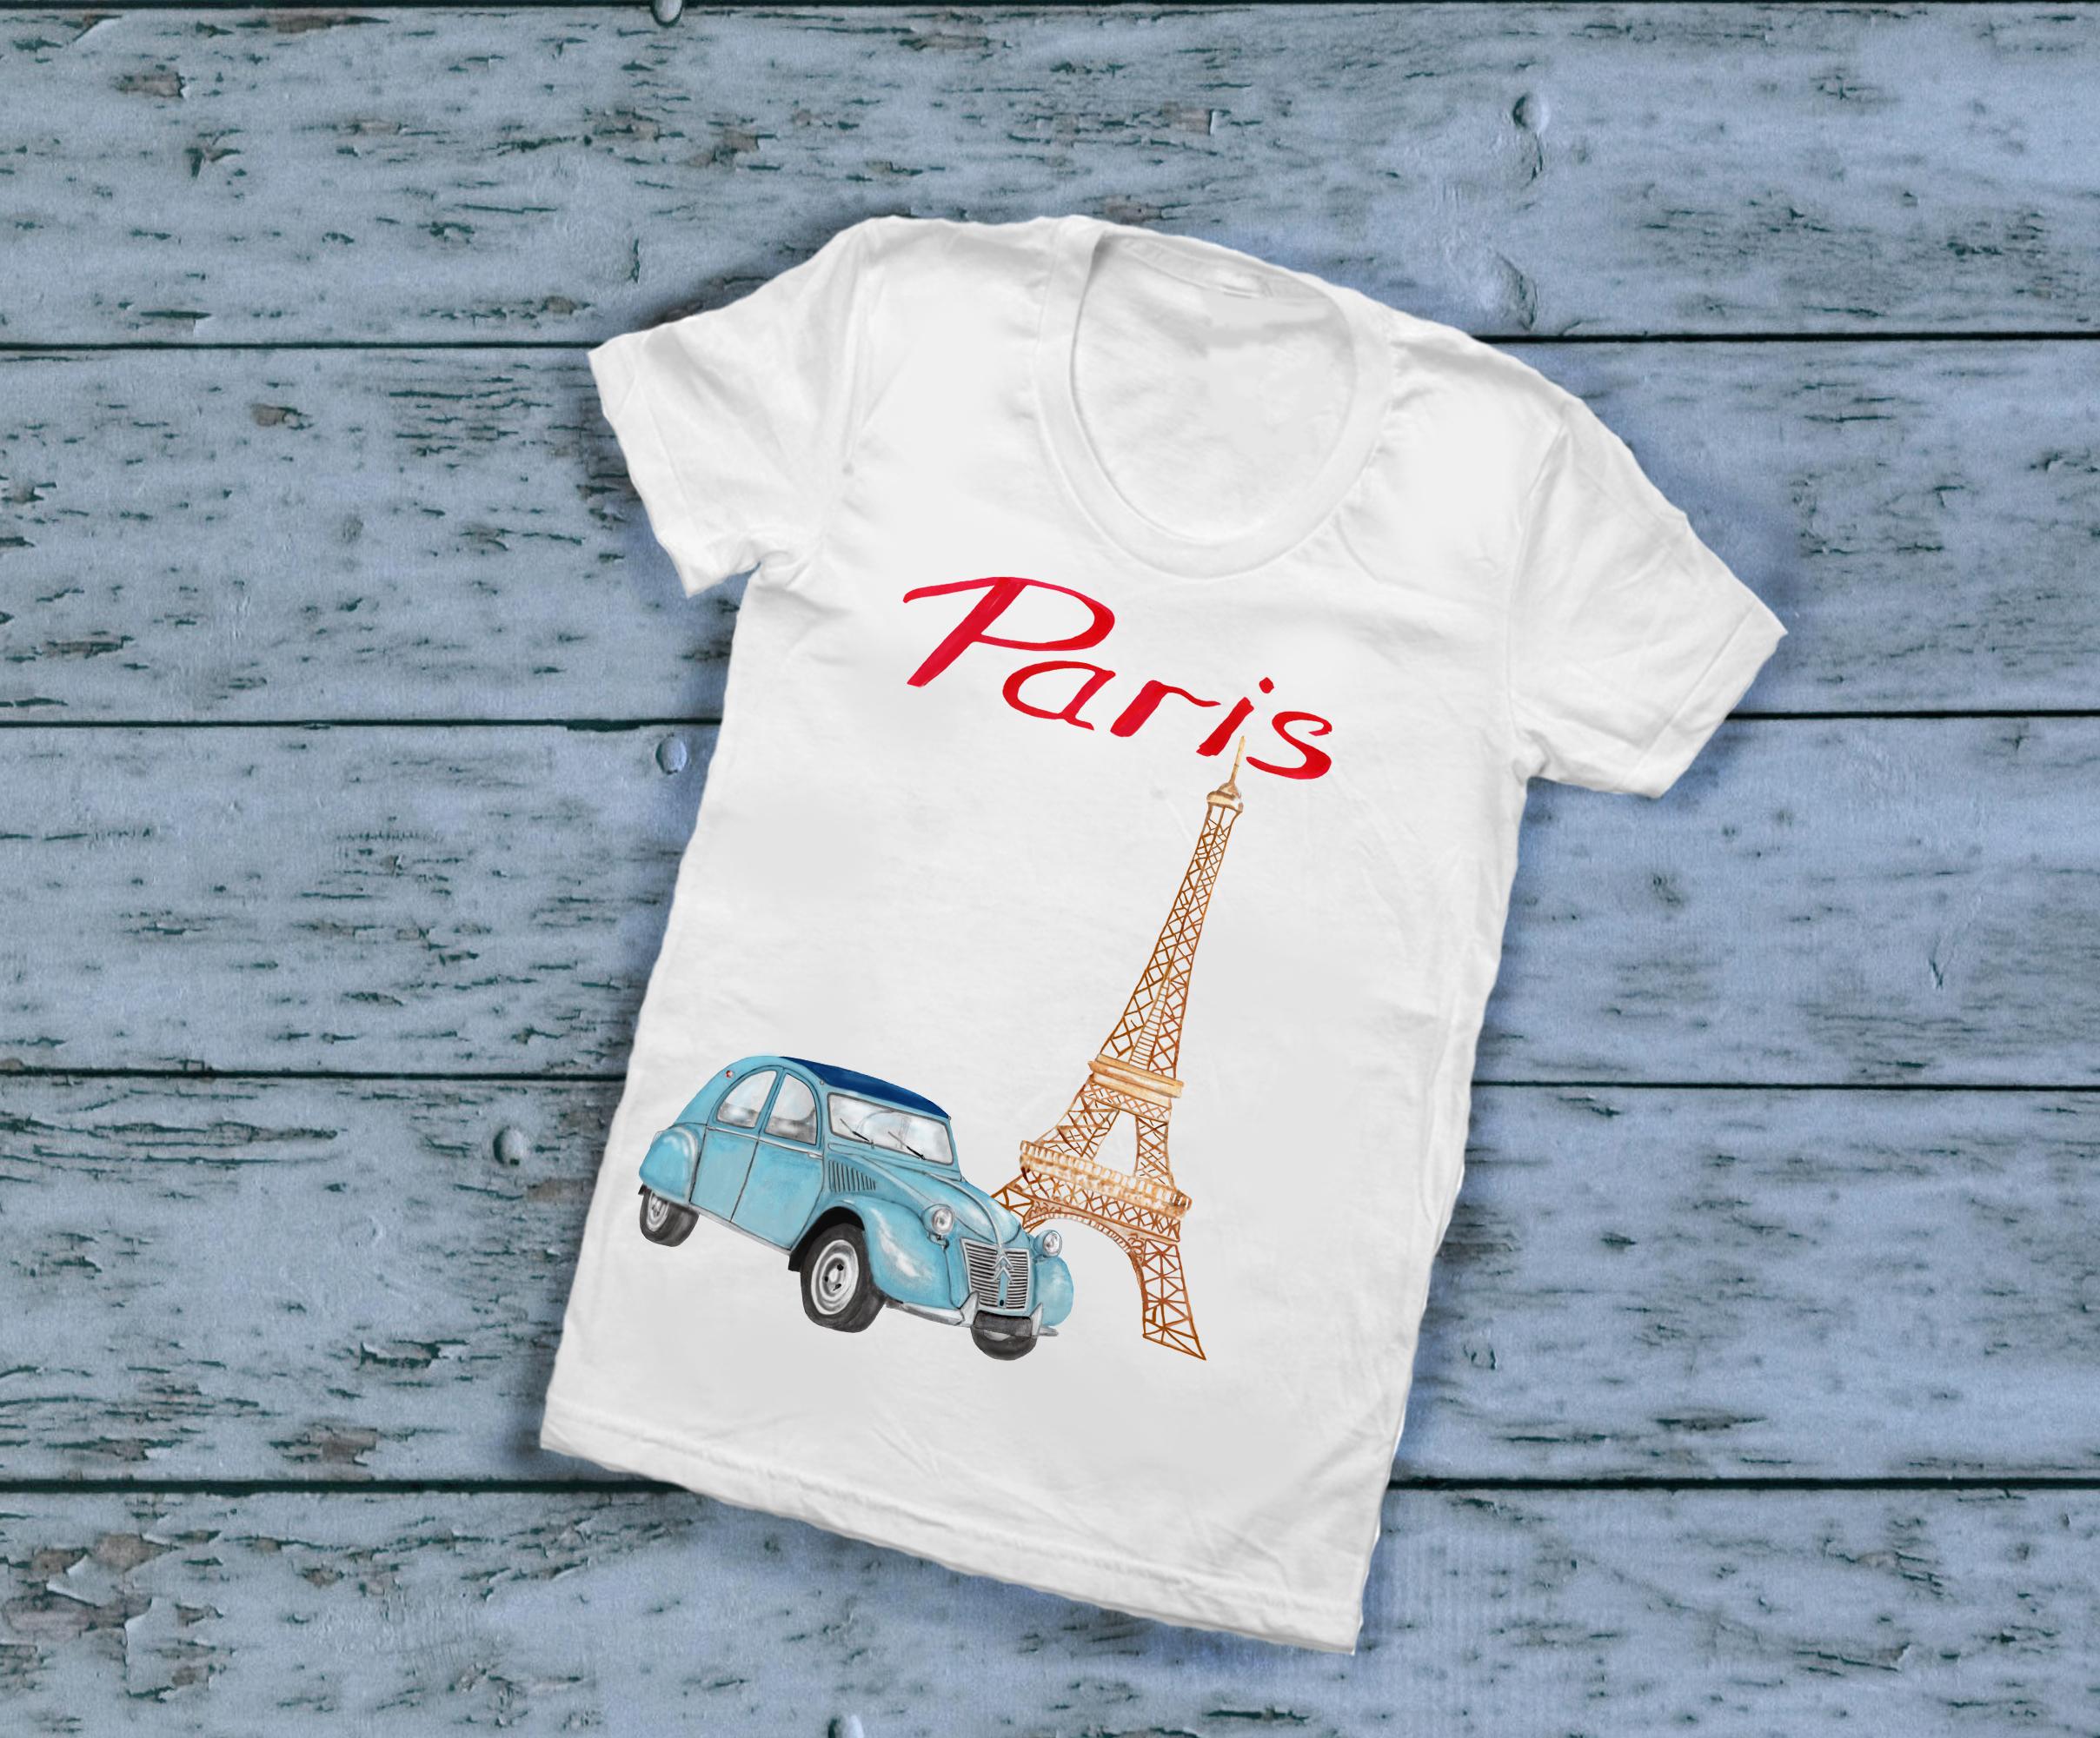 Paris clipart, Notre Dame, scooter clipart, eiffel tower example image 6